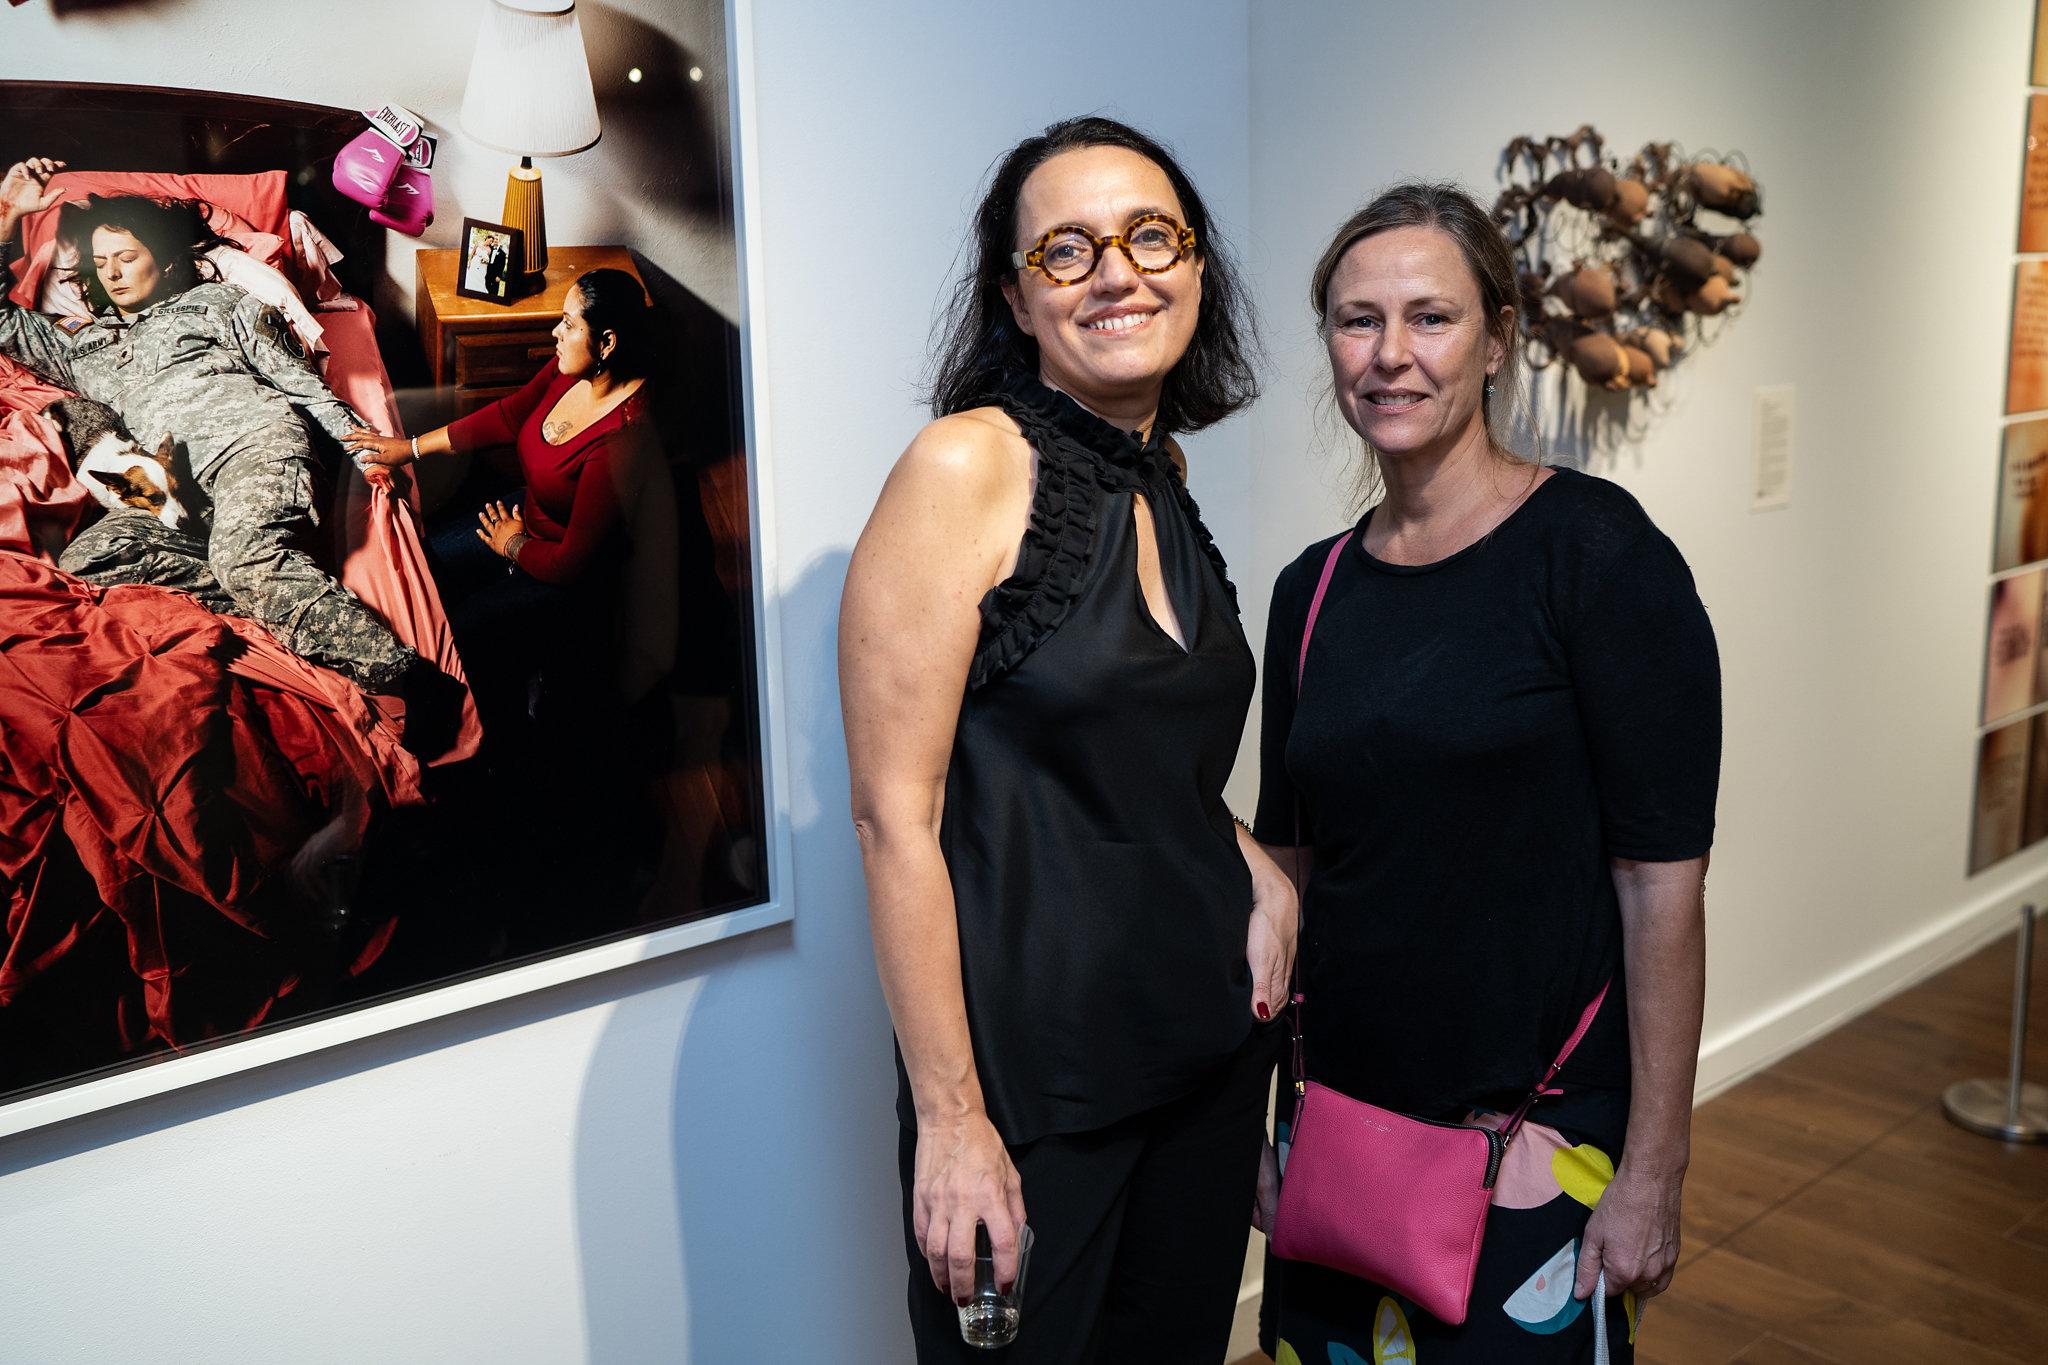 Monika Fabijanska, Jennifer Karady. The Un-Heroic-Act opening. Photo Austin Pogrob